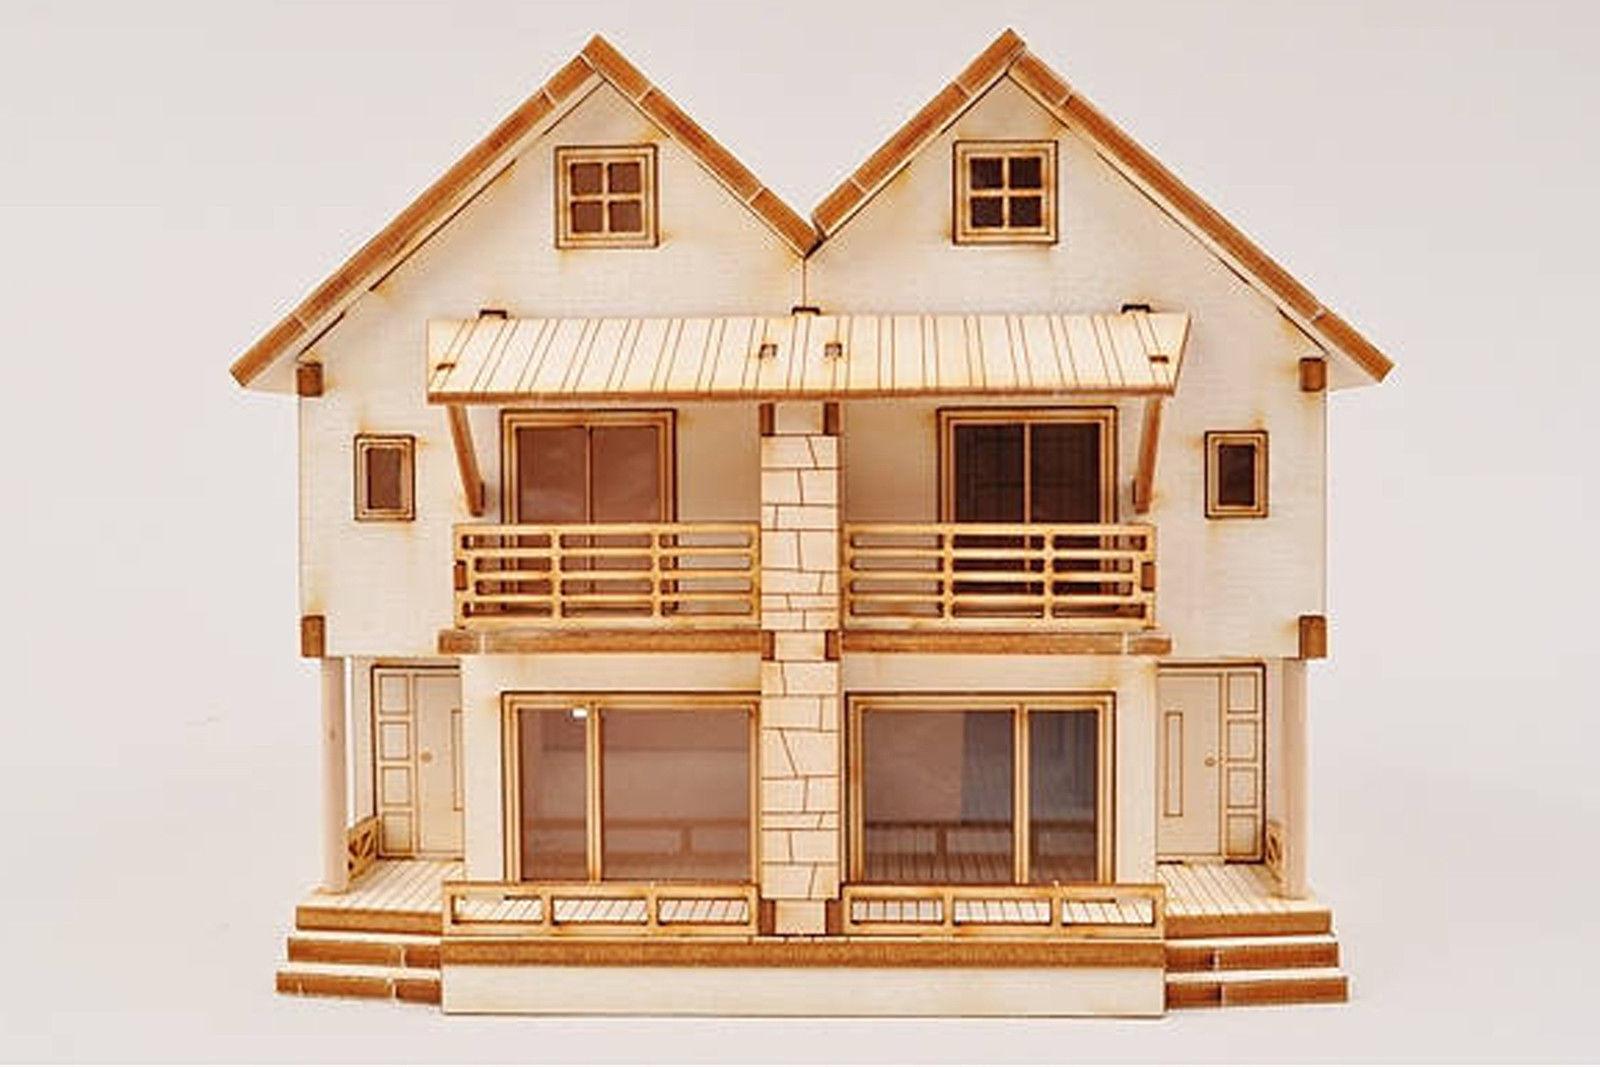 3D DUPLEX WOODEN HOUSE MODEL KIT HO scale 1/87 Miniature Home Kits Sets  Diorama